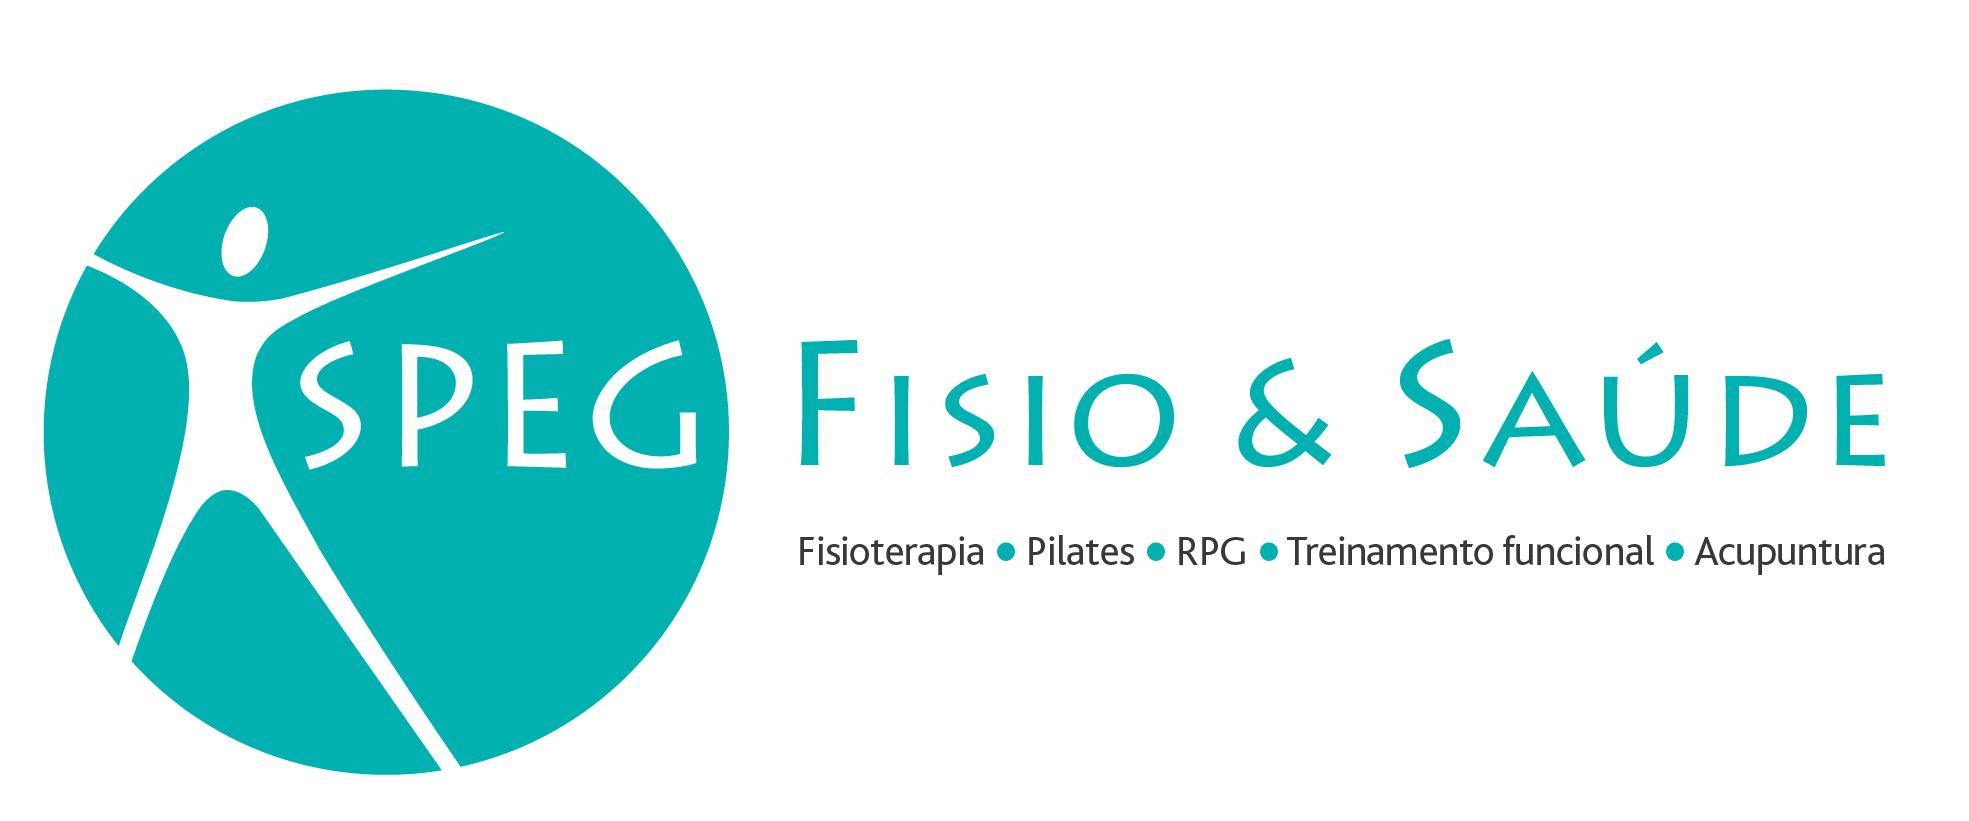 SPEG Fisioterapia & Saúde